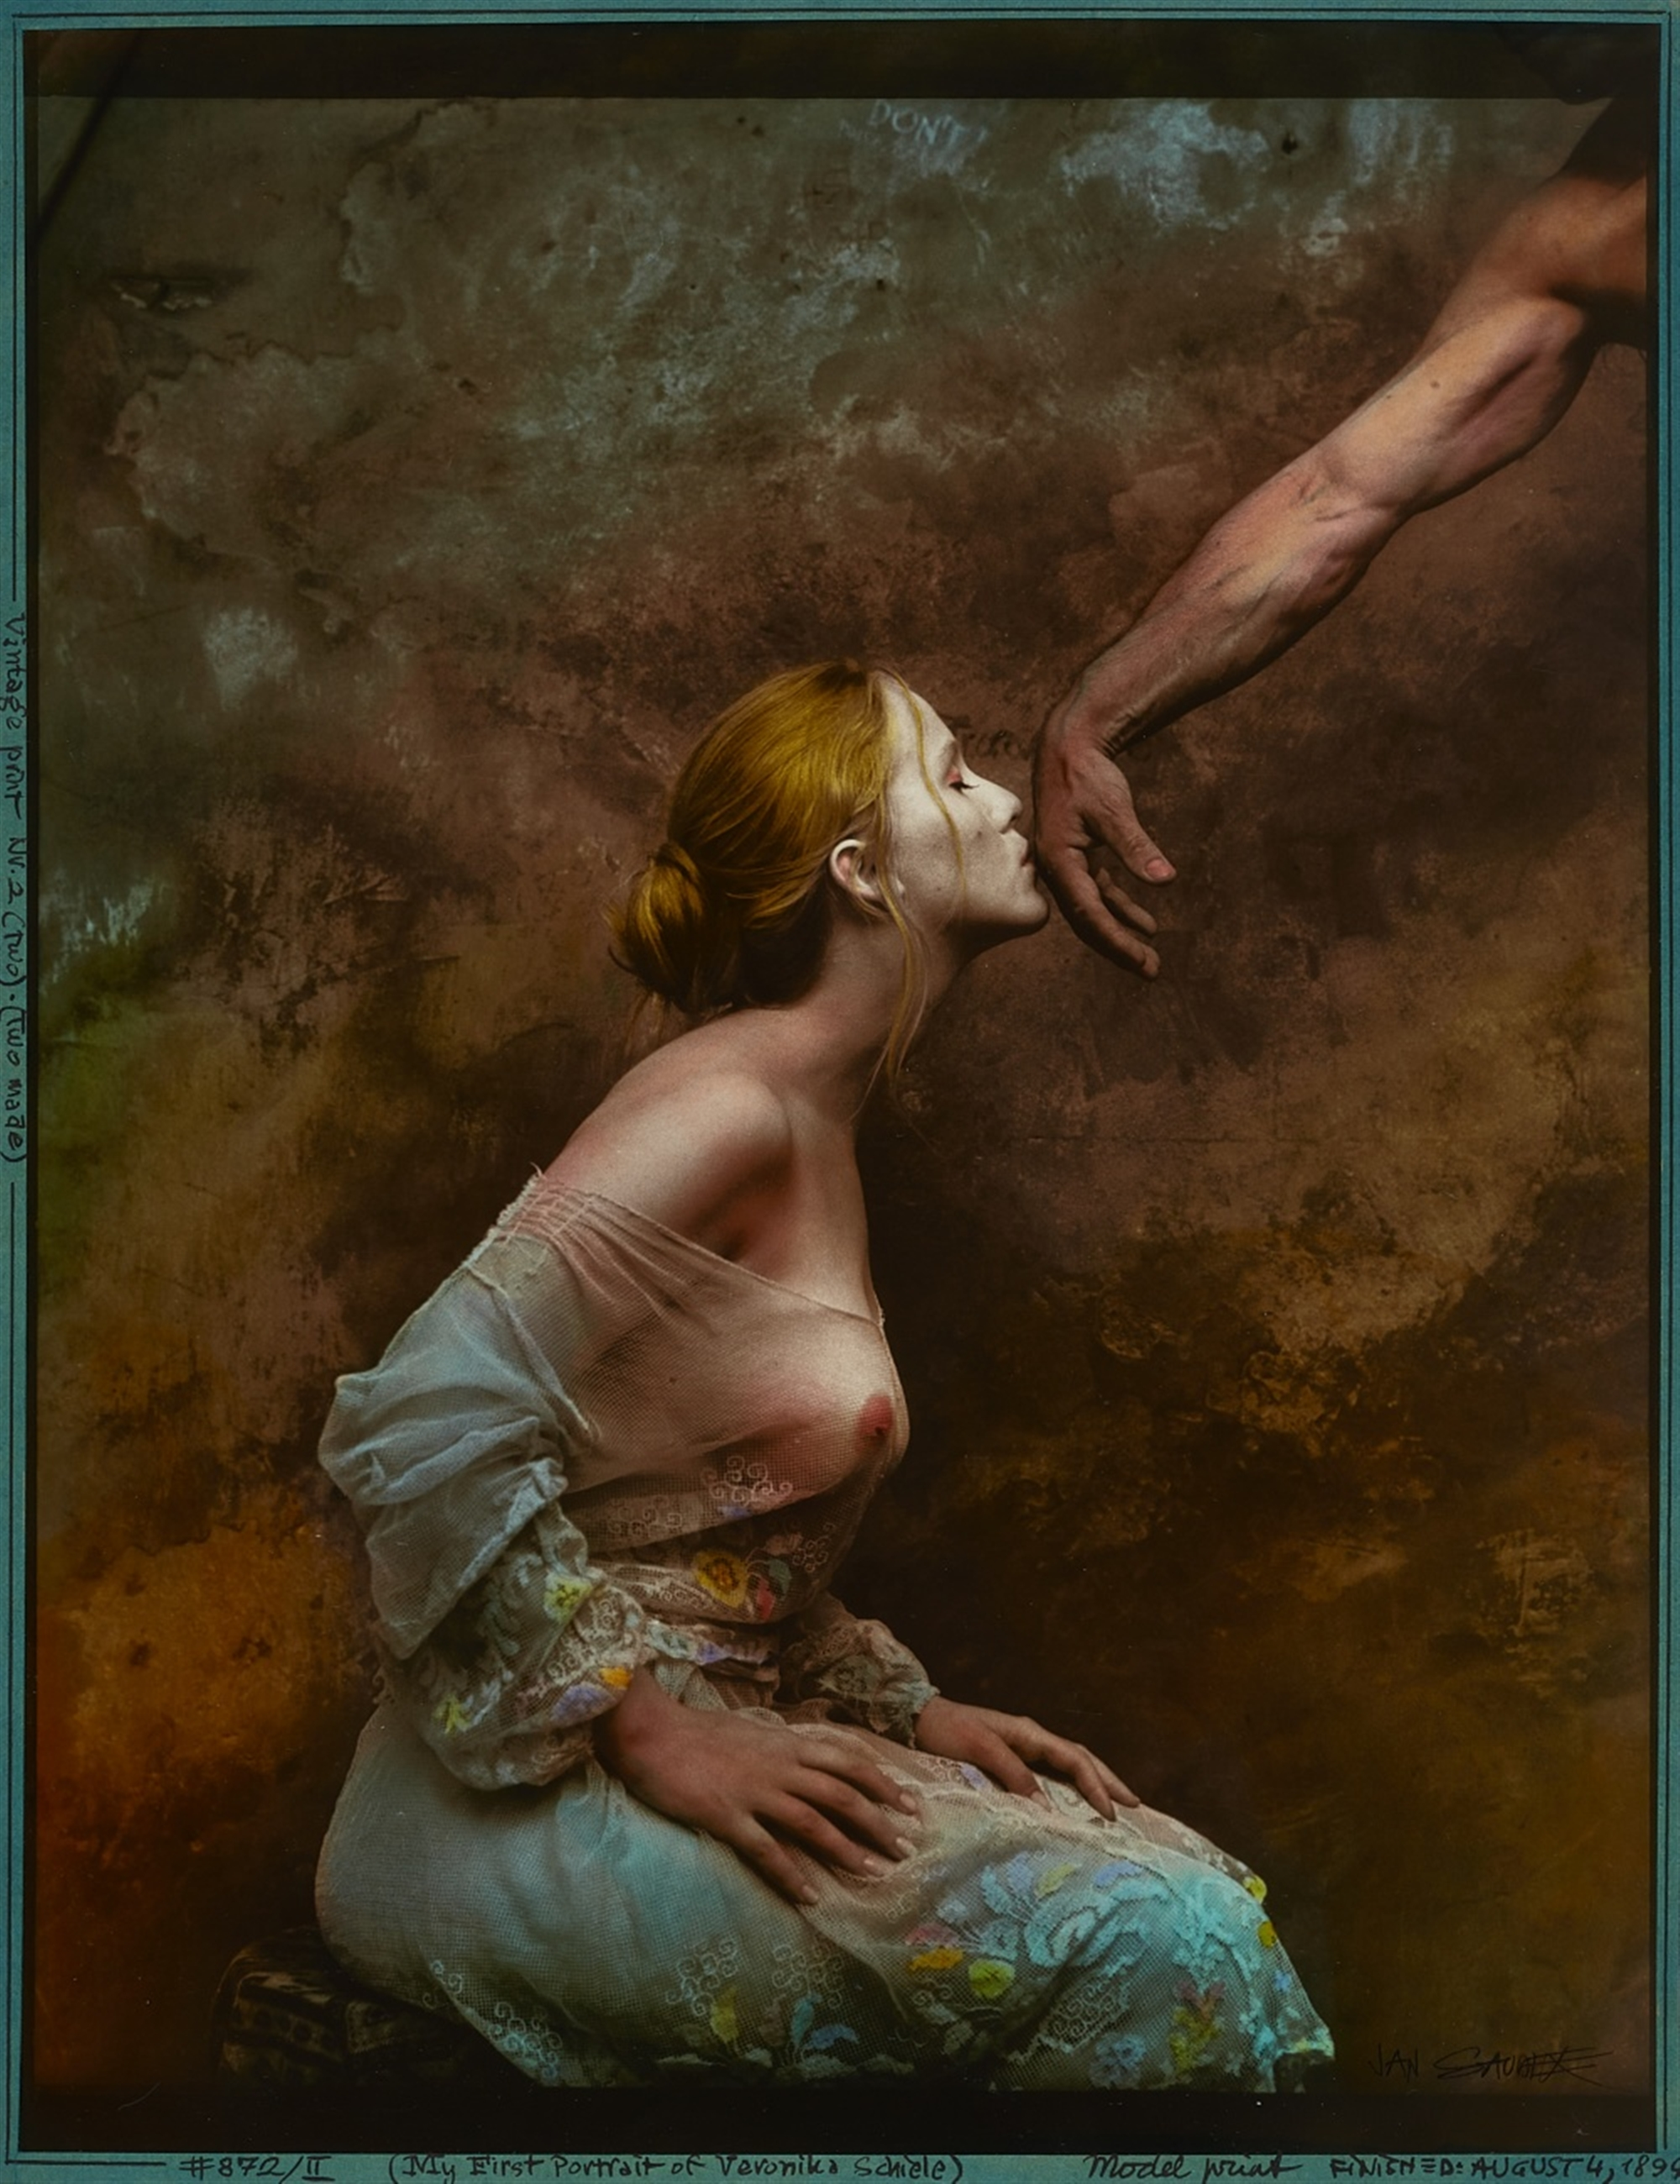 Jan Saudek<BR>My First Portrait of Veronika Schiele